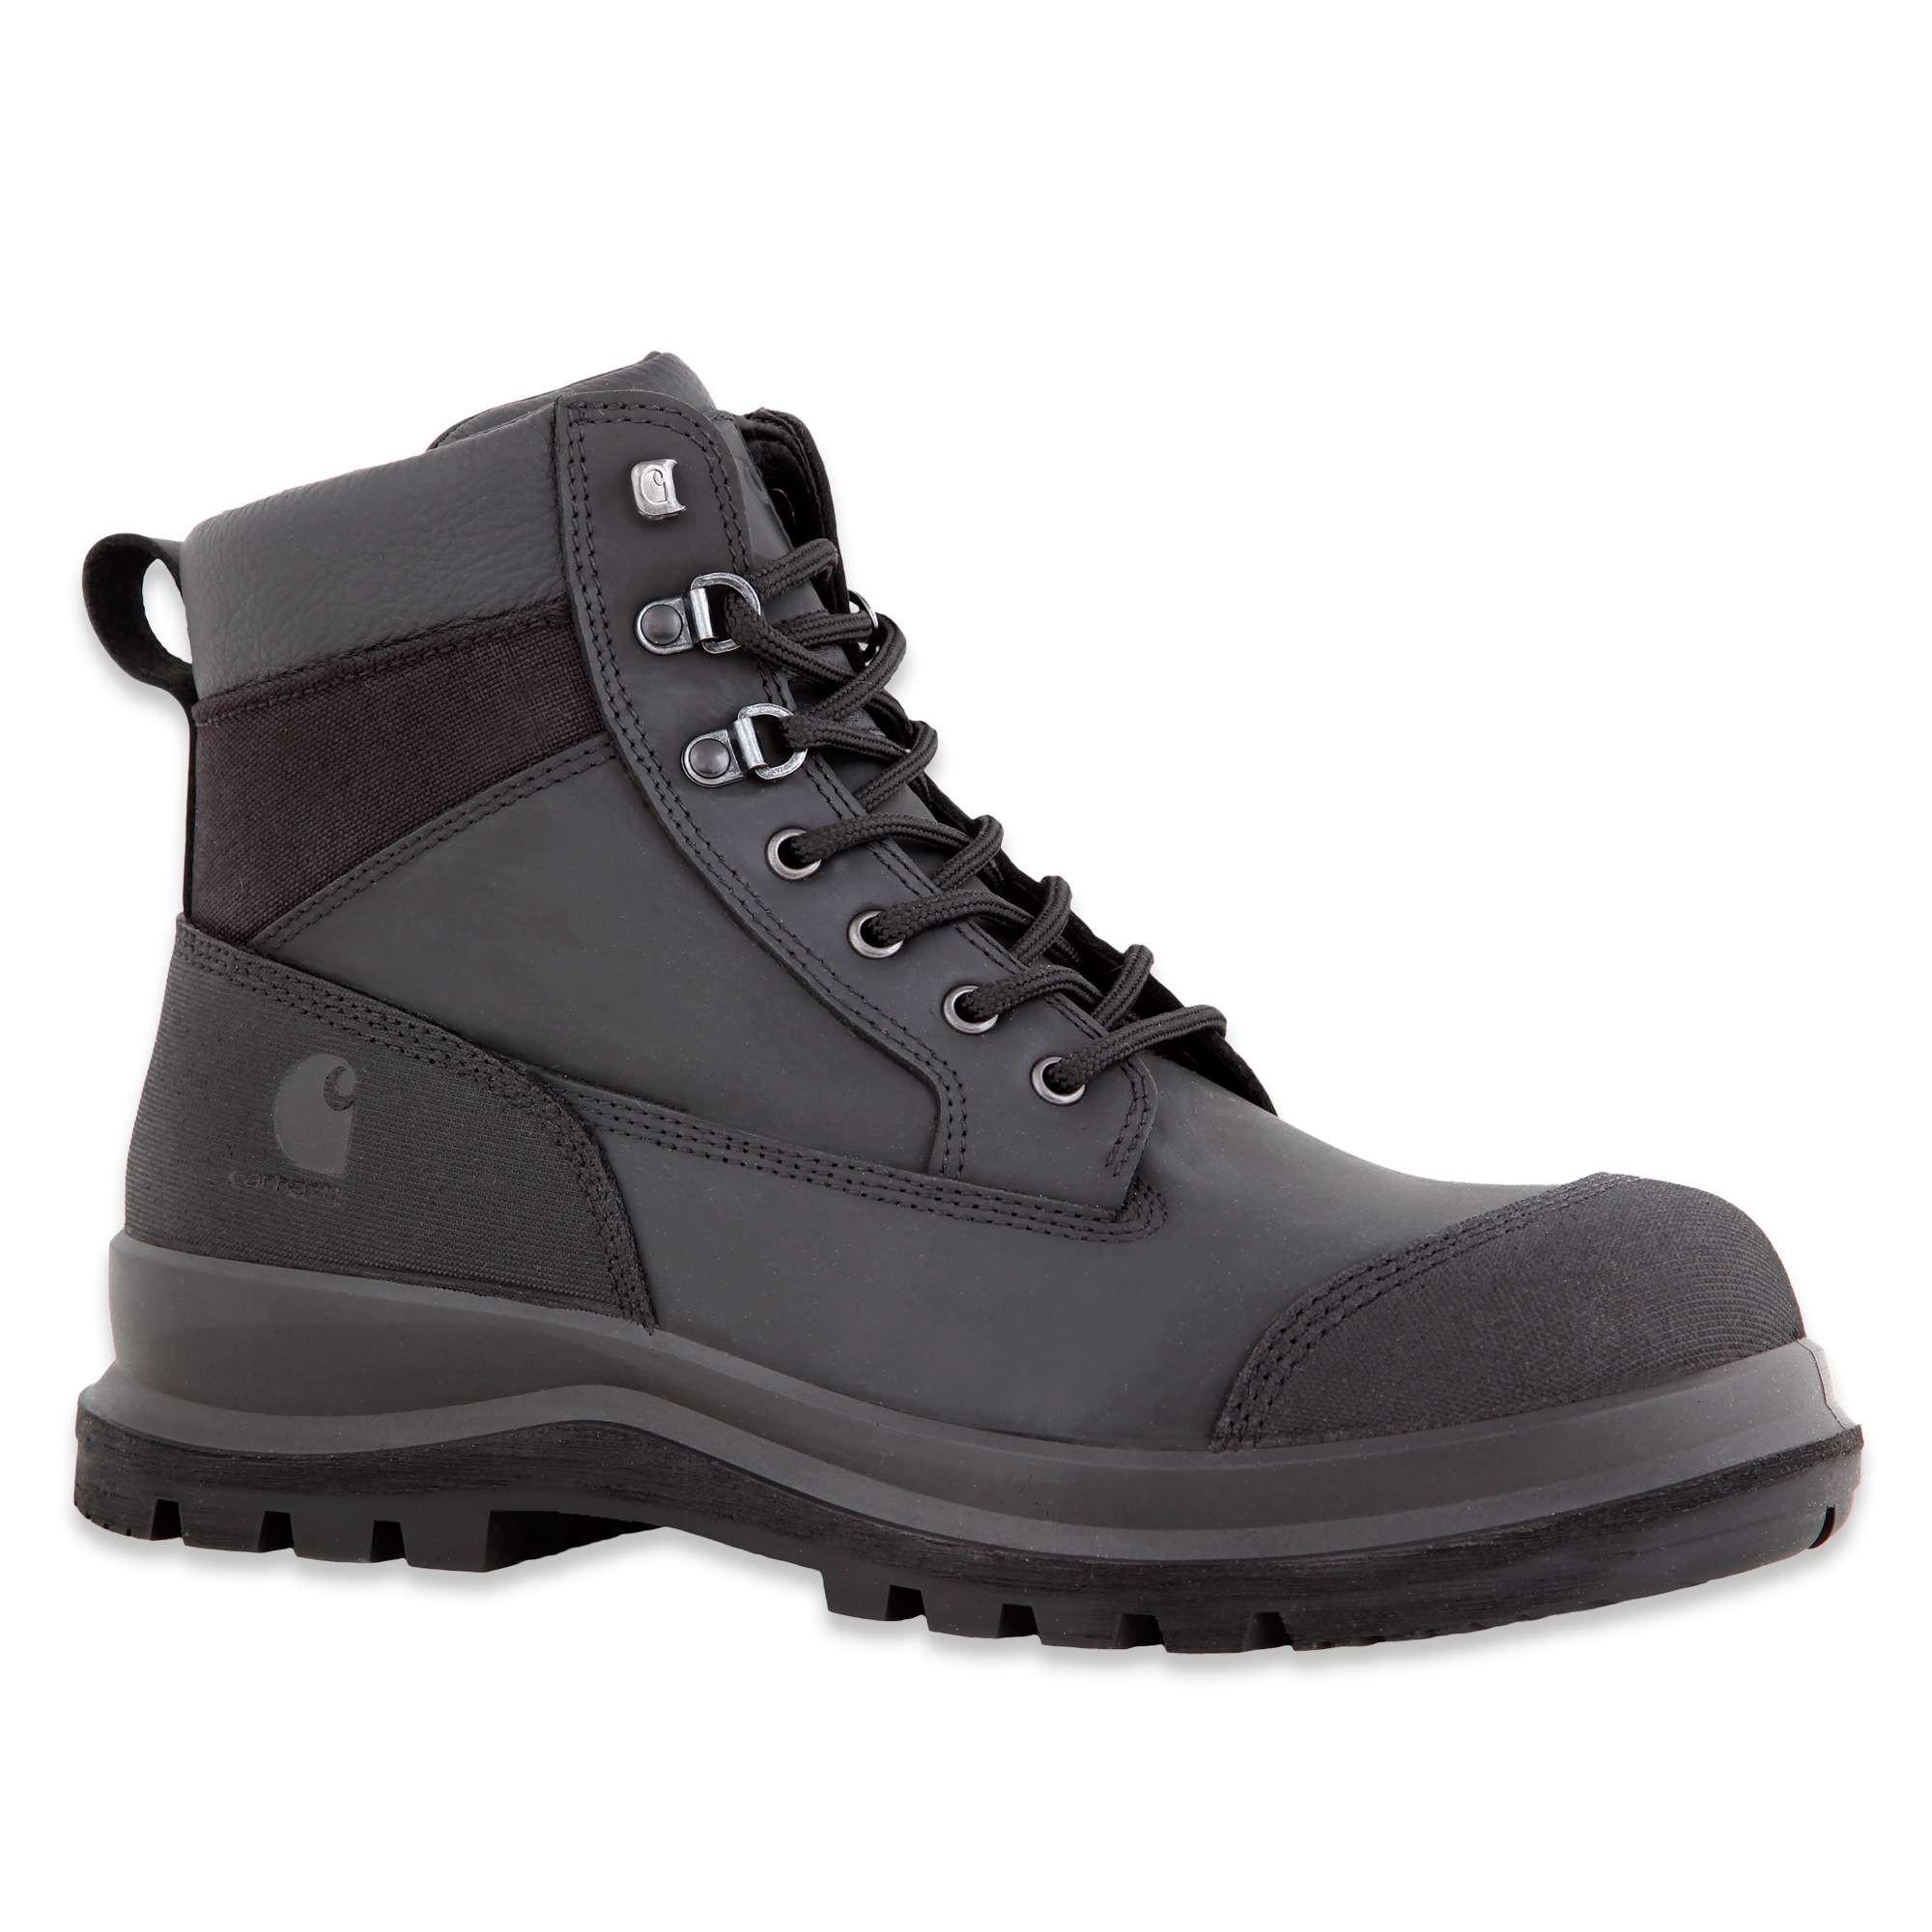 "Ботинки Carhartt Detroit 6"" S3 Work Boot - F702903 (Black, 41)"